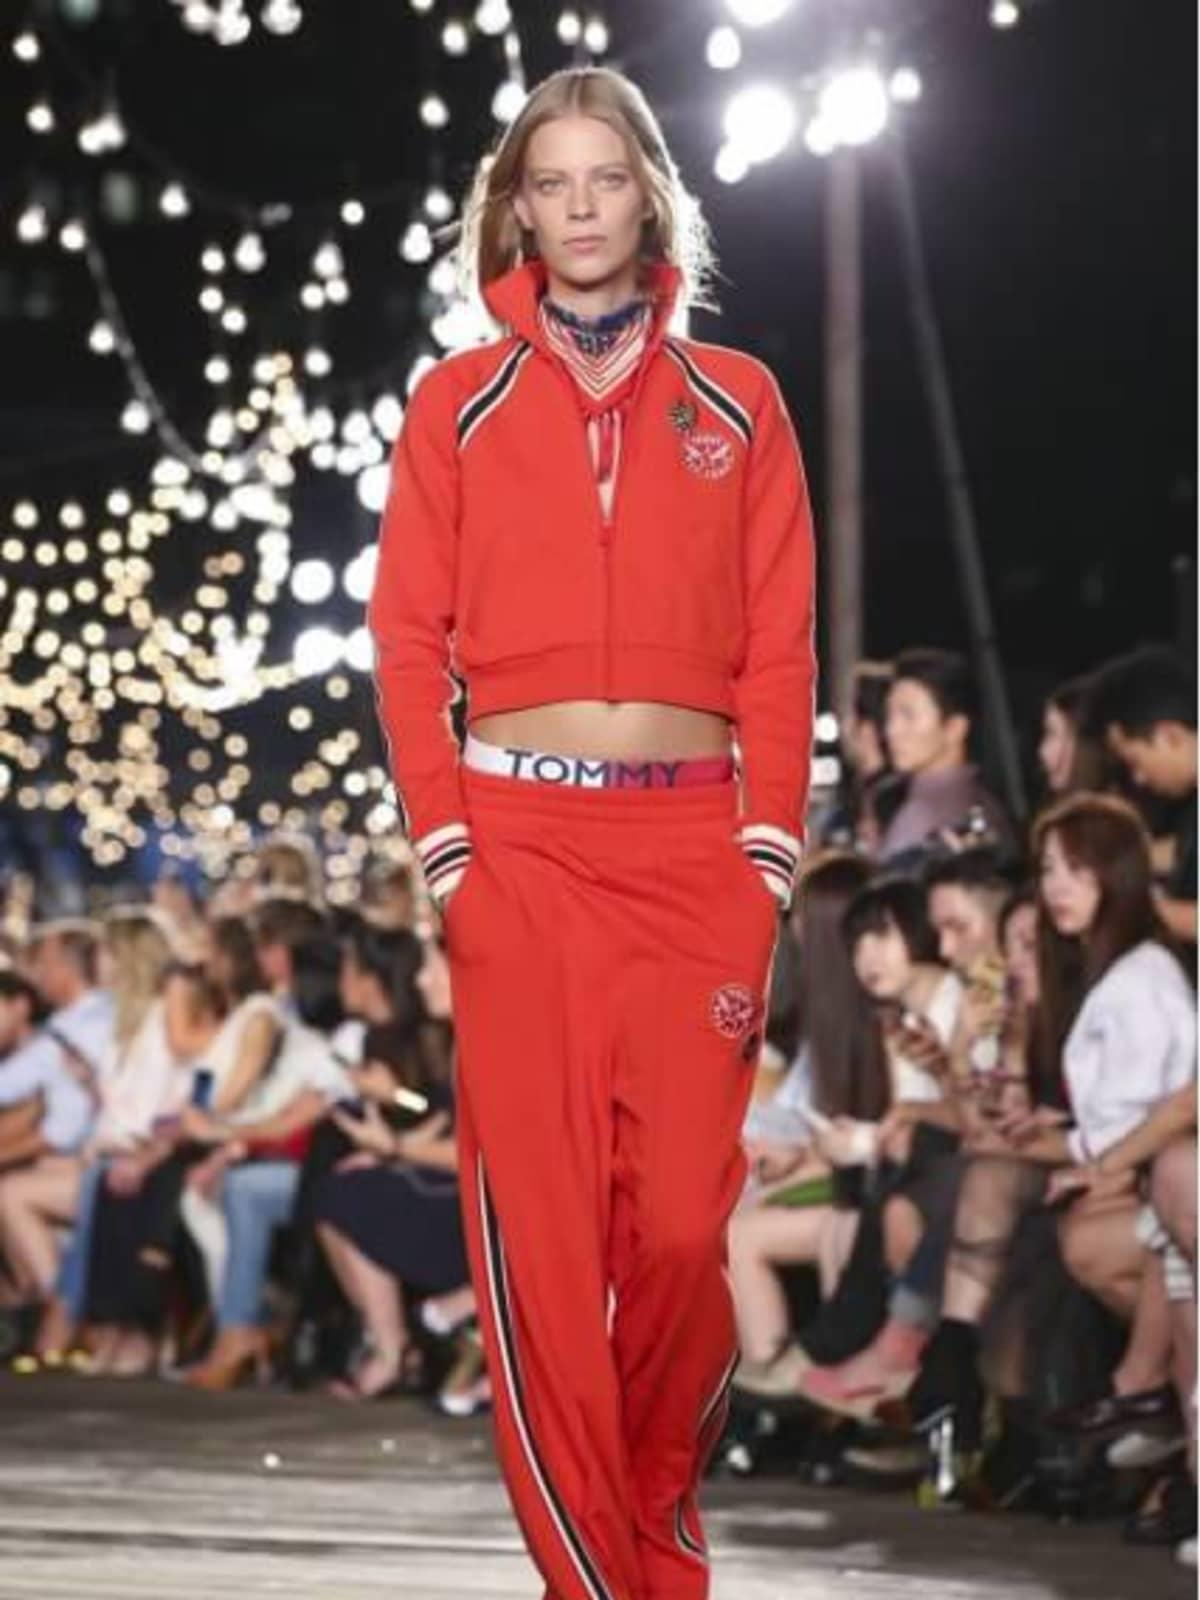 Tommy Hilfiger track suit